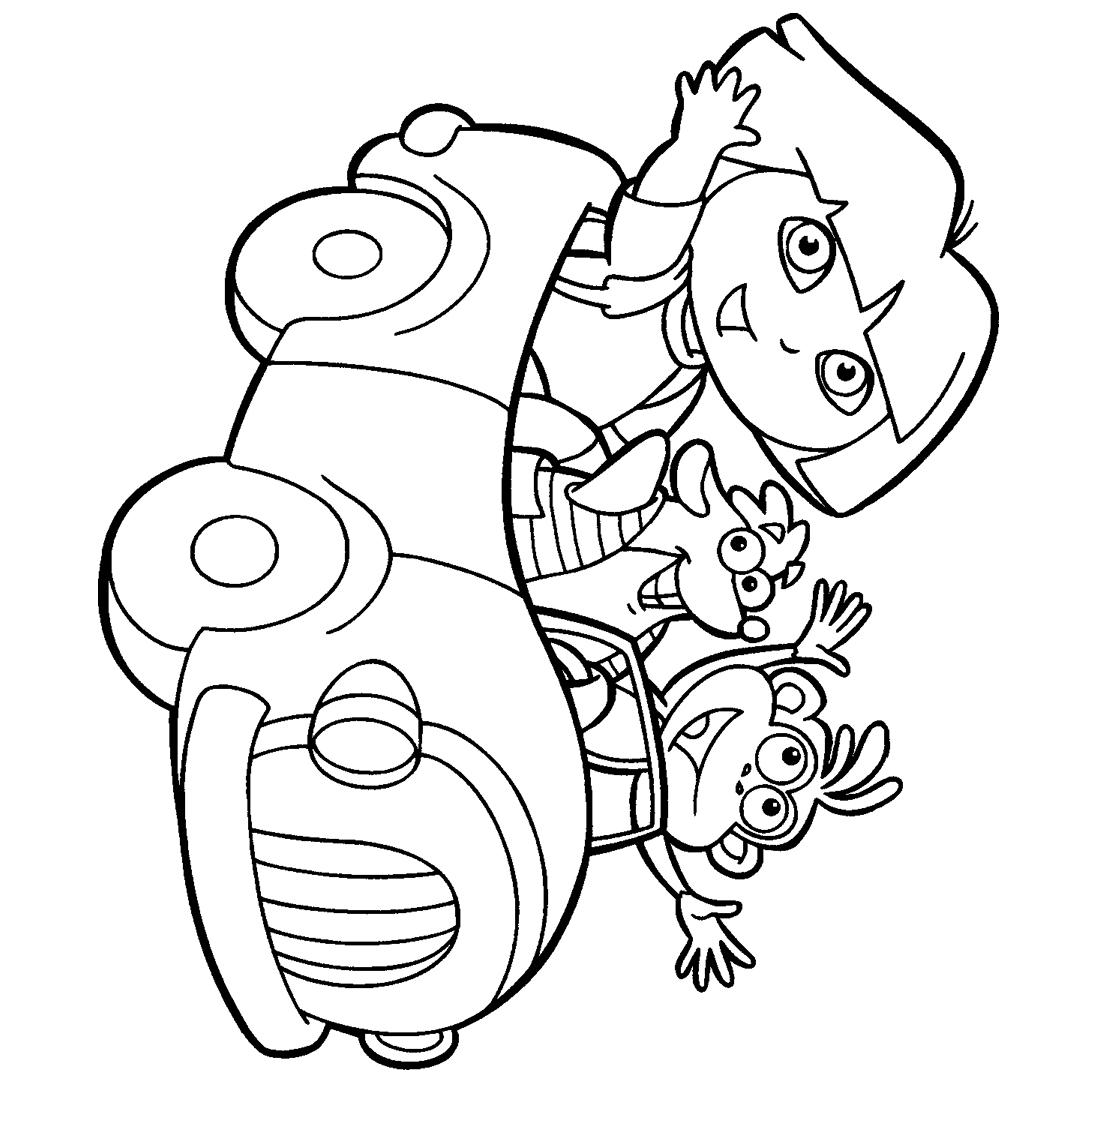 Dora the Explorer Coloring Pages (5)